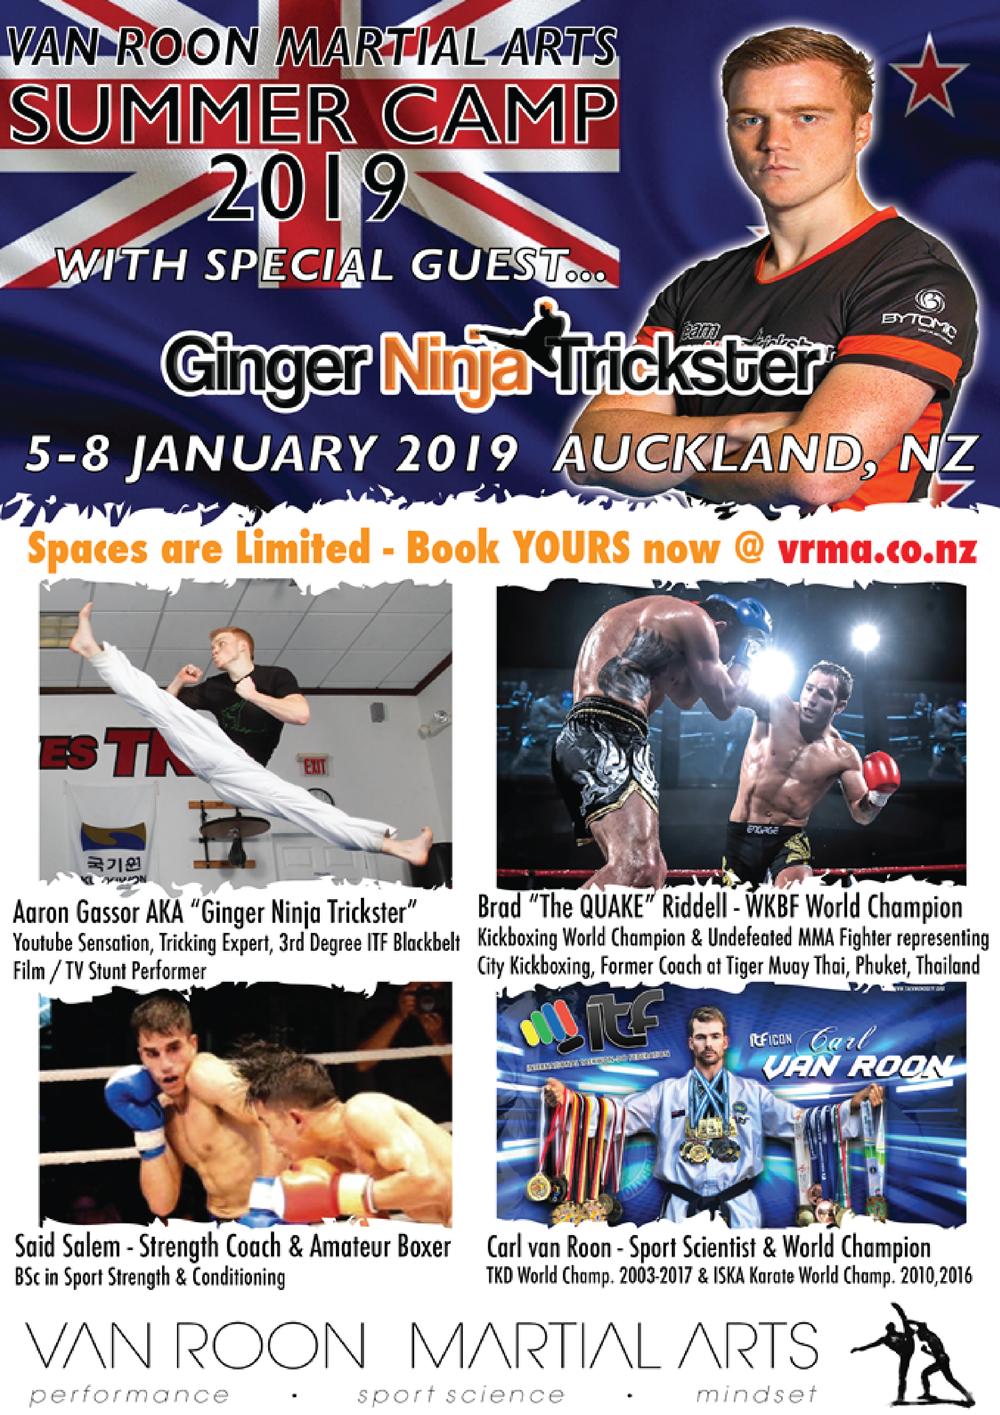 VRMA Summer Camp 2019 Poster-01.png